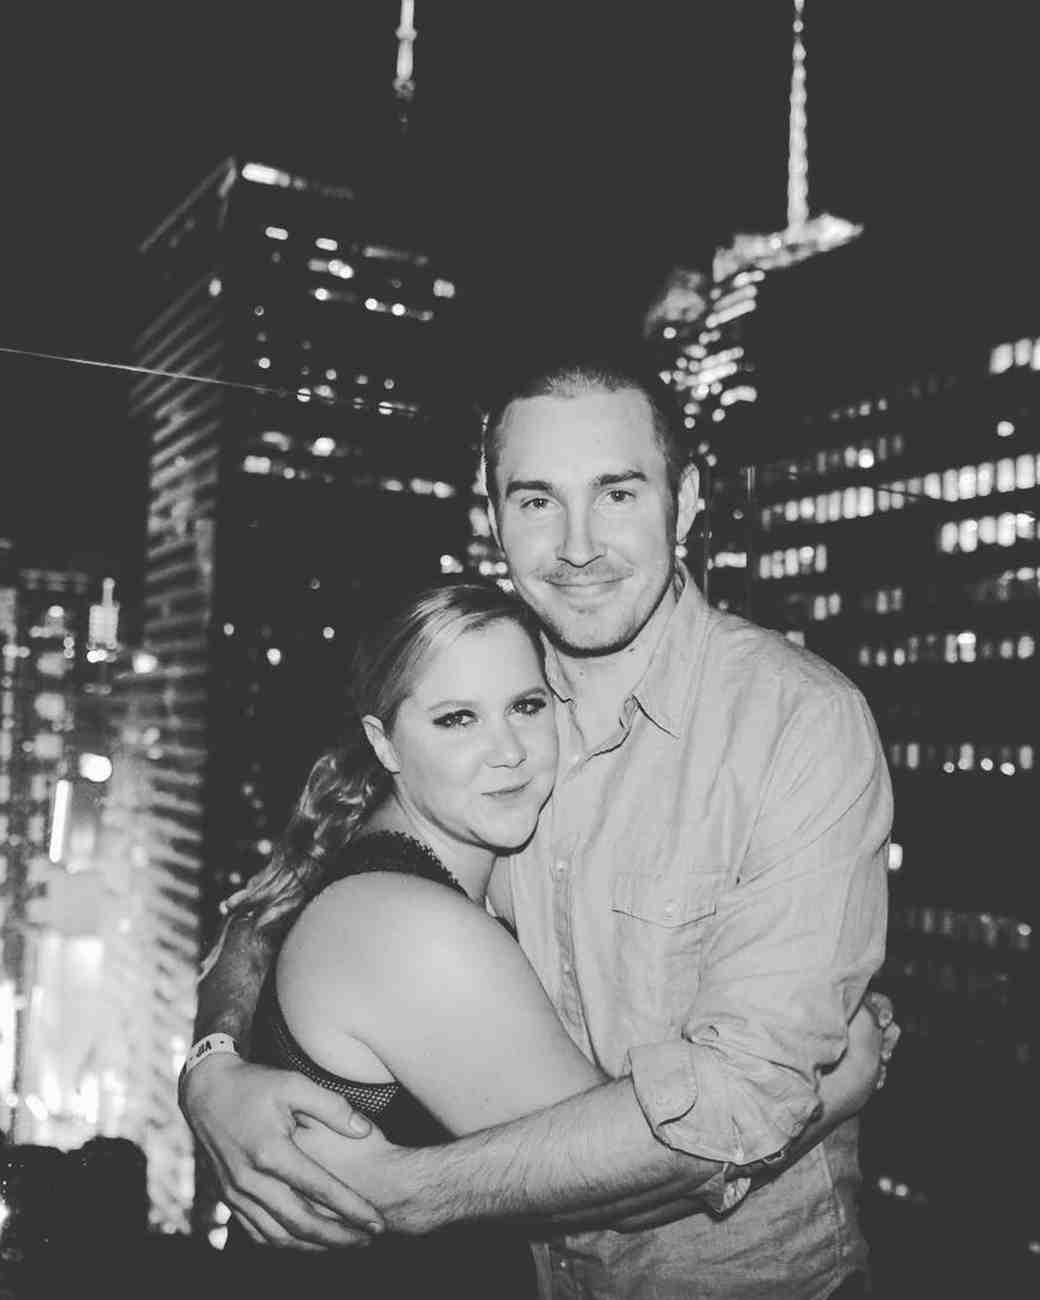 Amy Schumer and Ben Hanisch Skyline Photograph